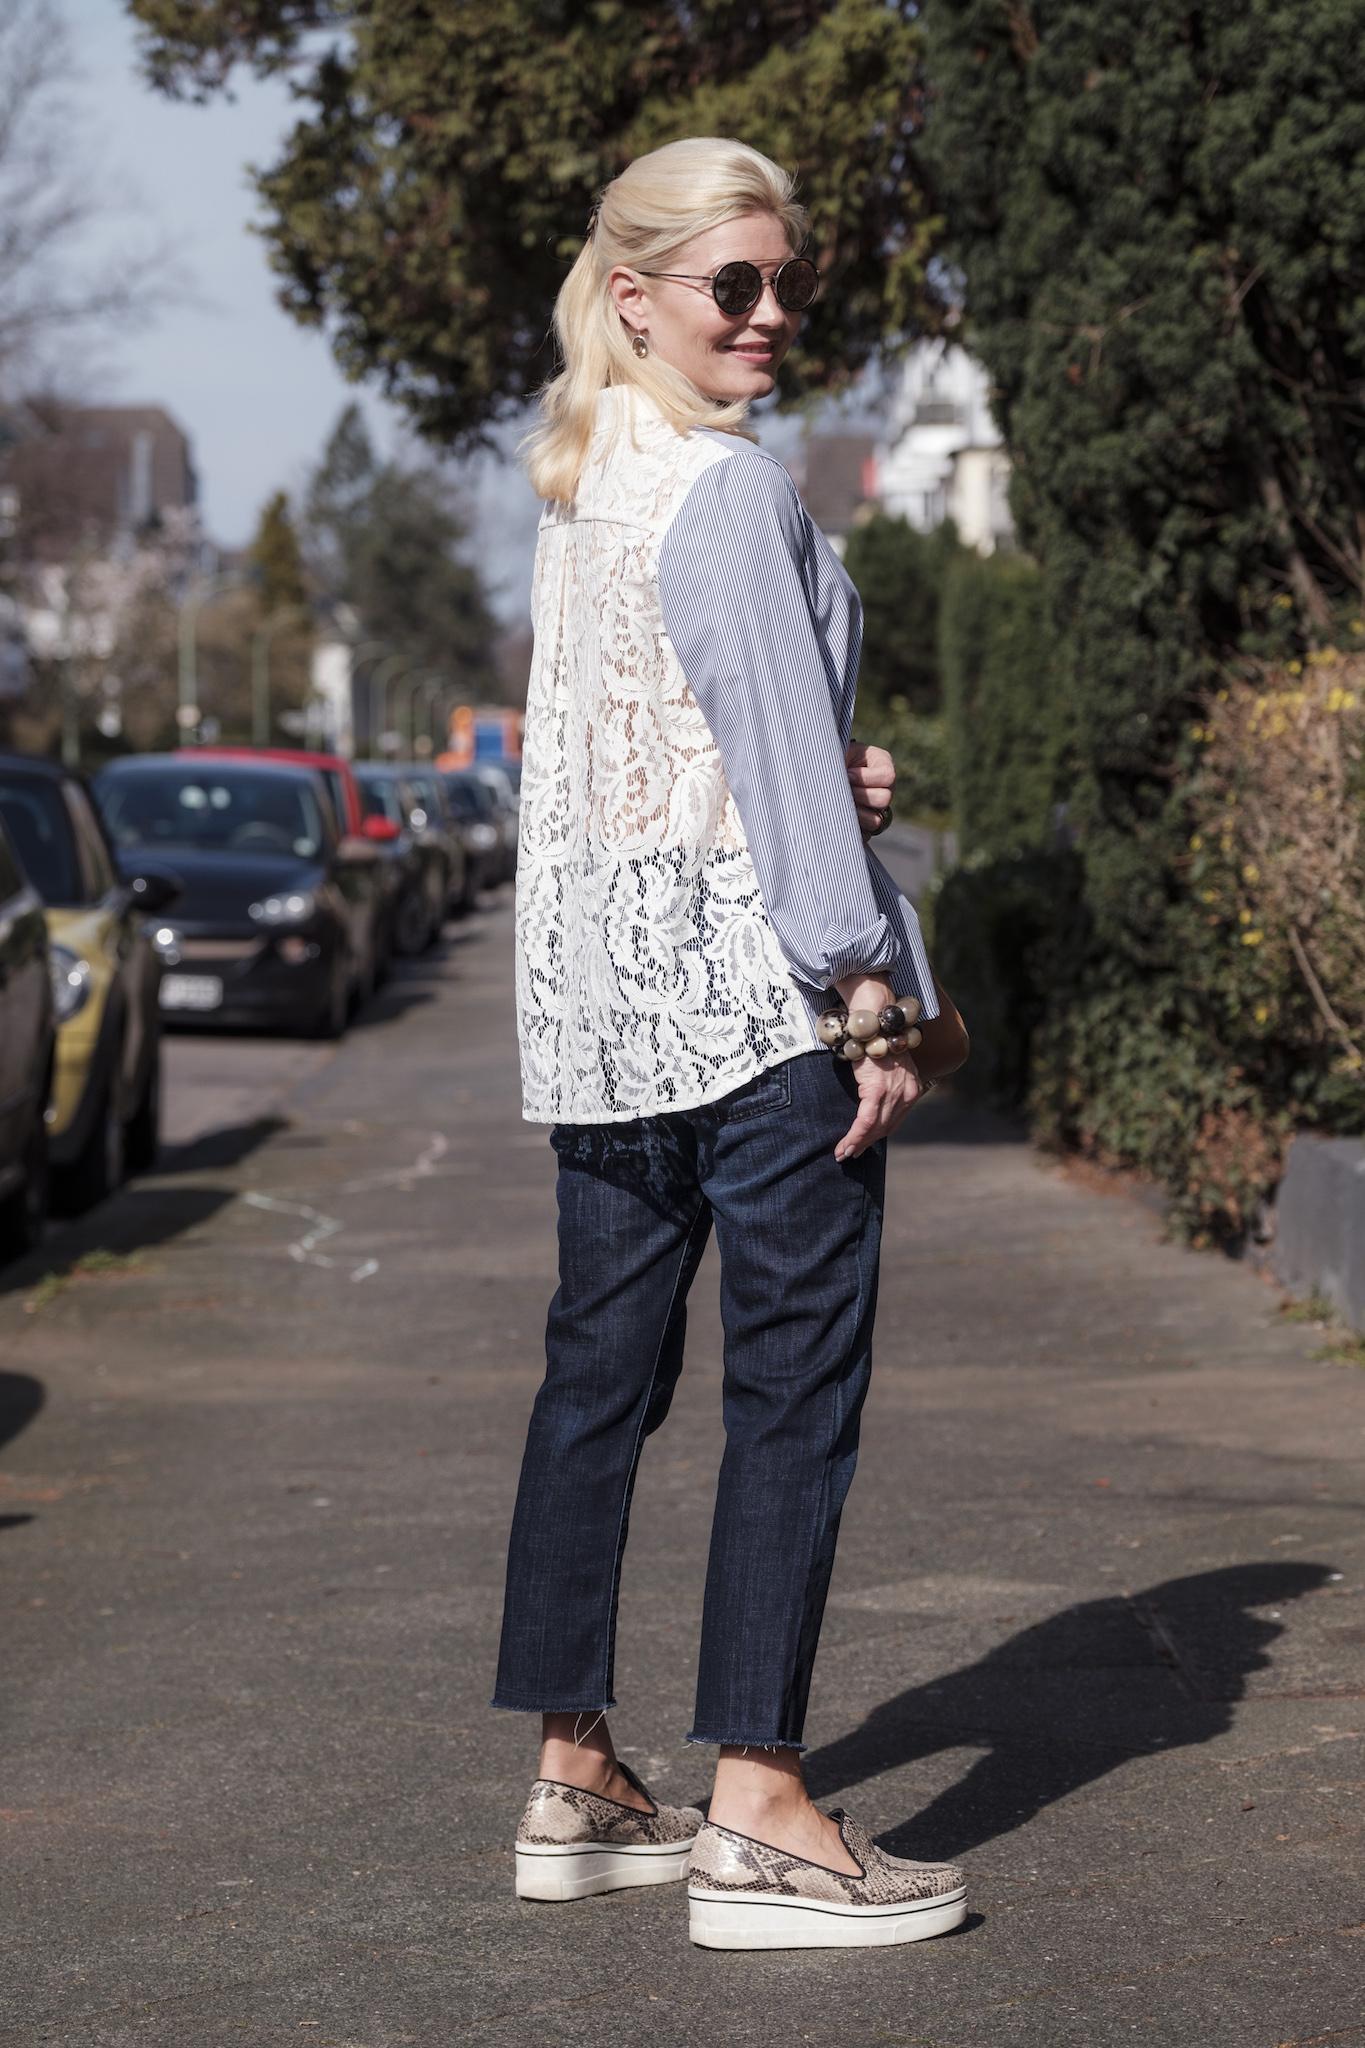 Sem Per Lei fashion, SemPerLei Mode, Fashion-Blog Lieblingsstil, gestreifte Bluse blau weiß mit Spitze, Fashion-Blog, Lieblingsstil.com,1